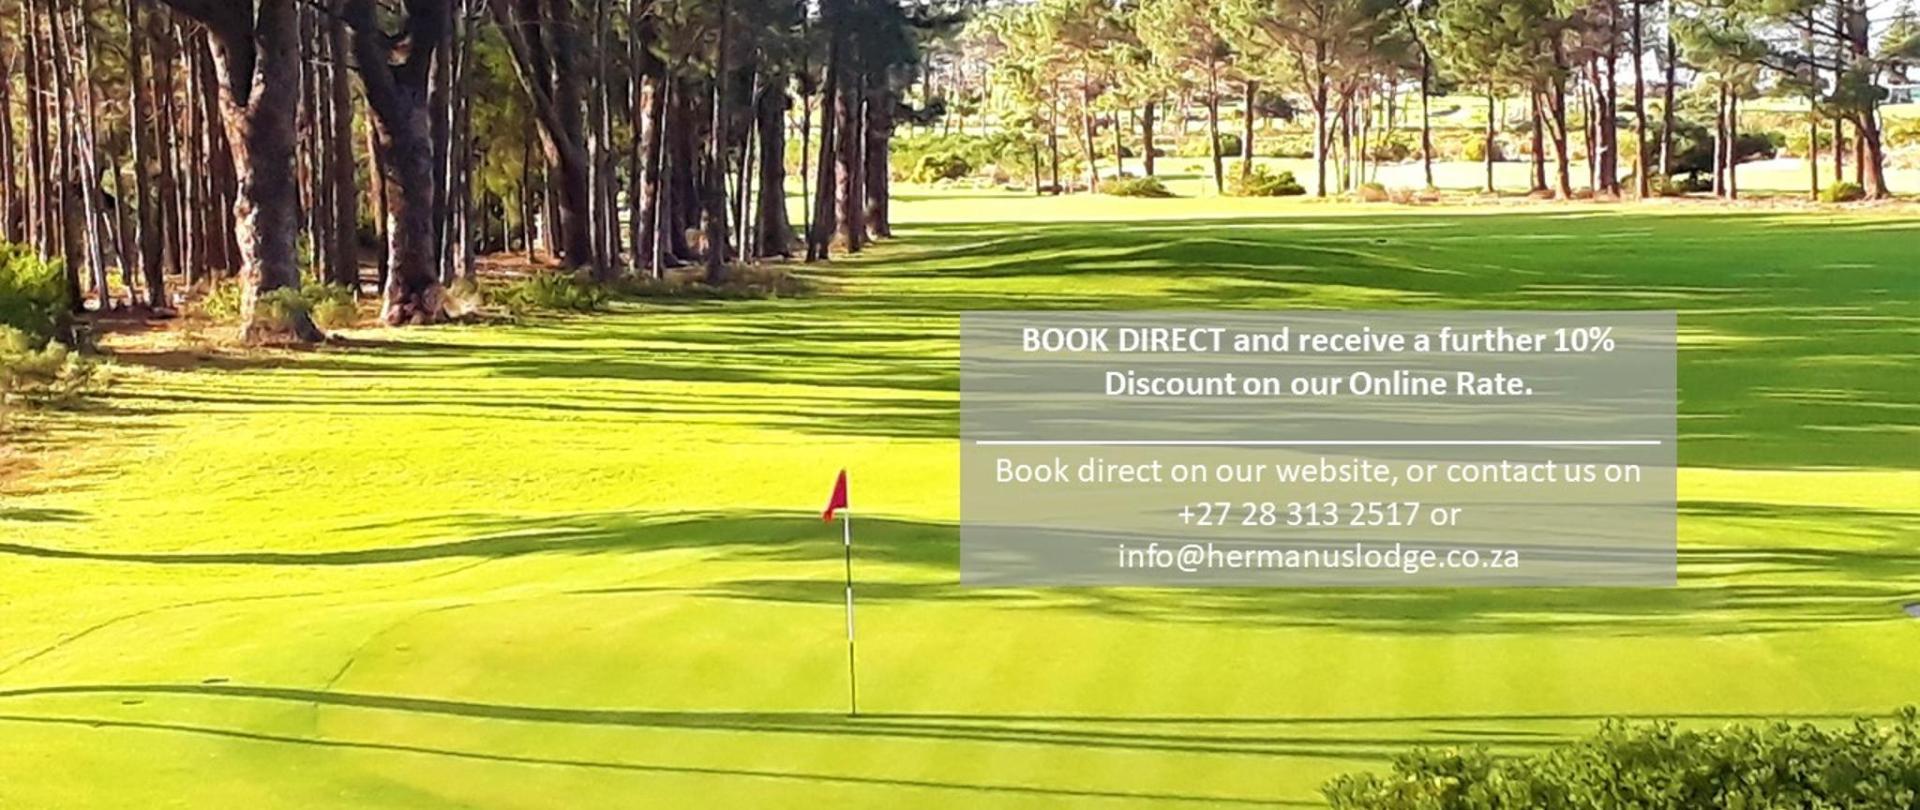 Discount 10% Photo LOTG.jpg